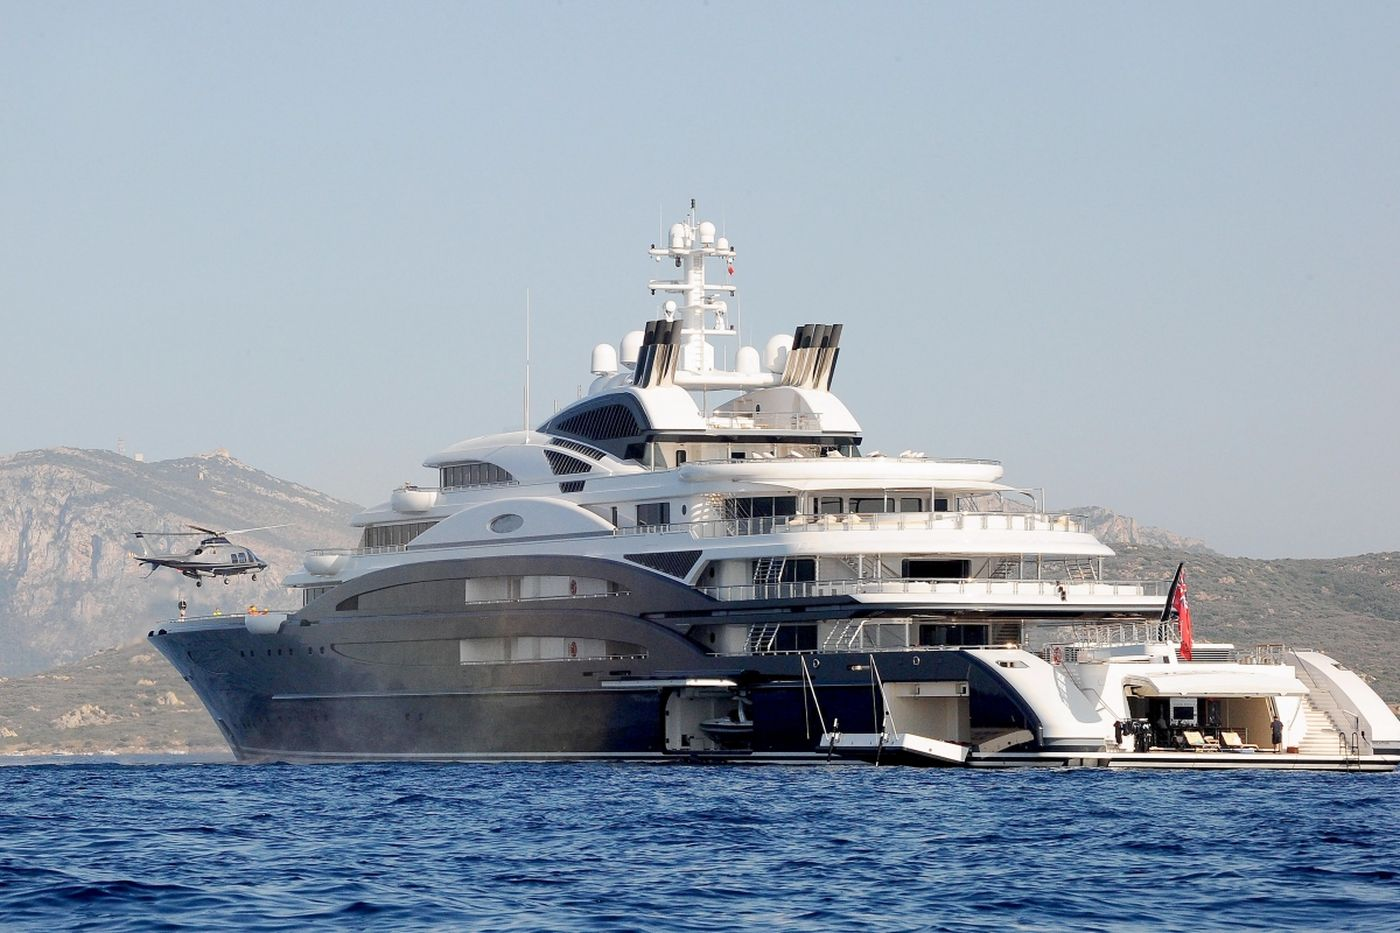 Bill Gates' boat, Serene